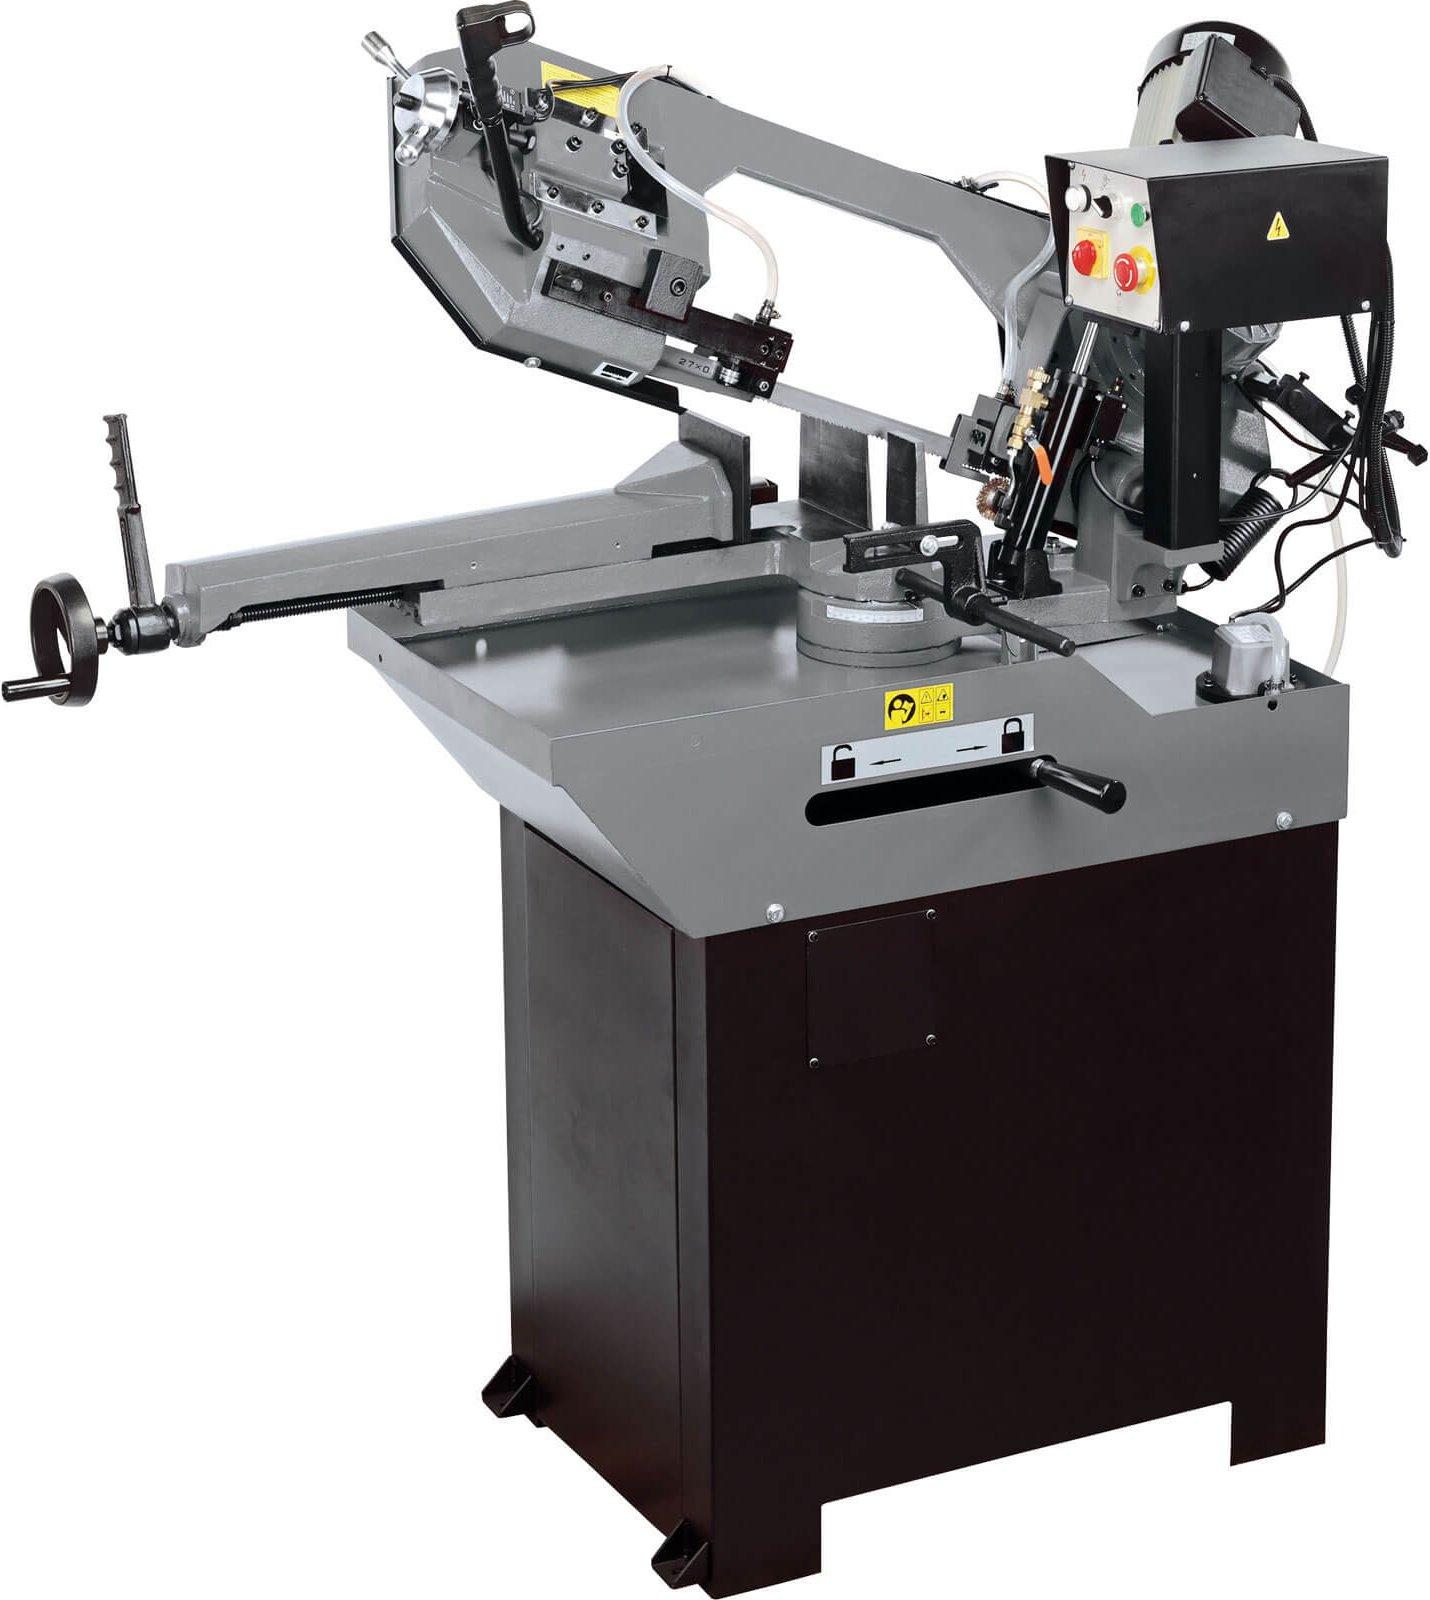 Draper MBS260 Professional Horizontal Metal Cutting Bandsaw 240v